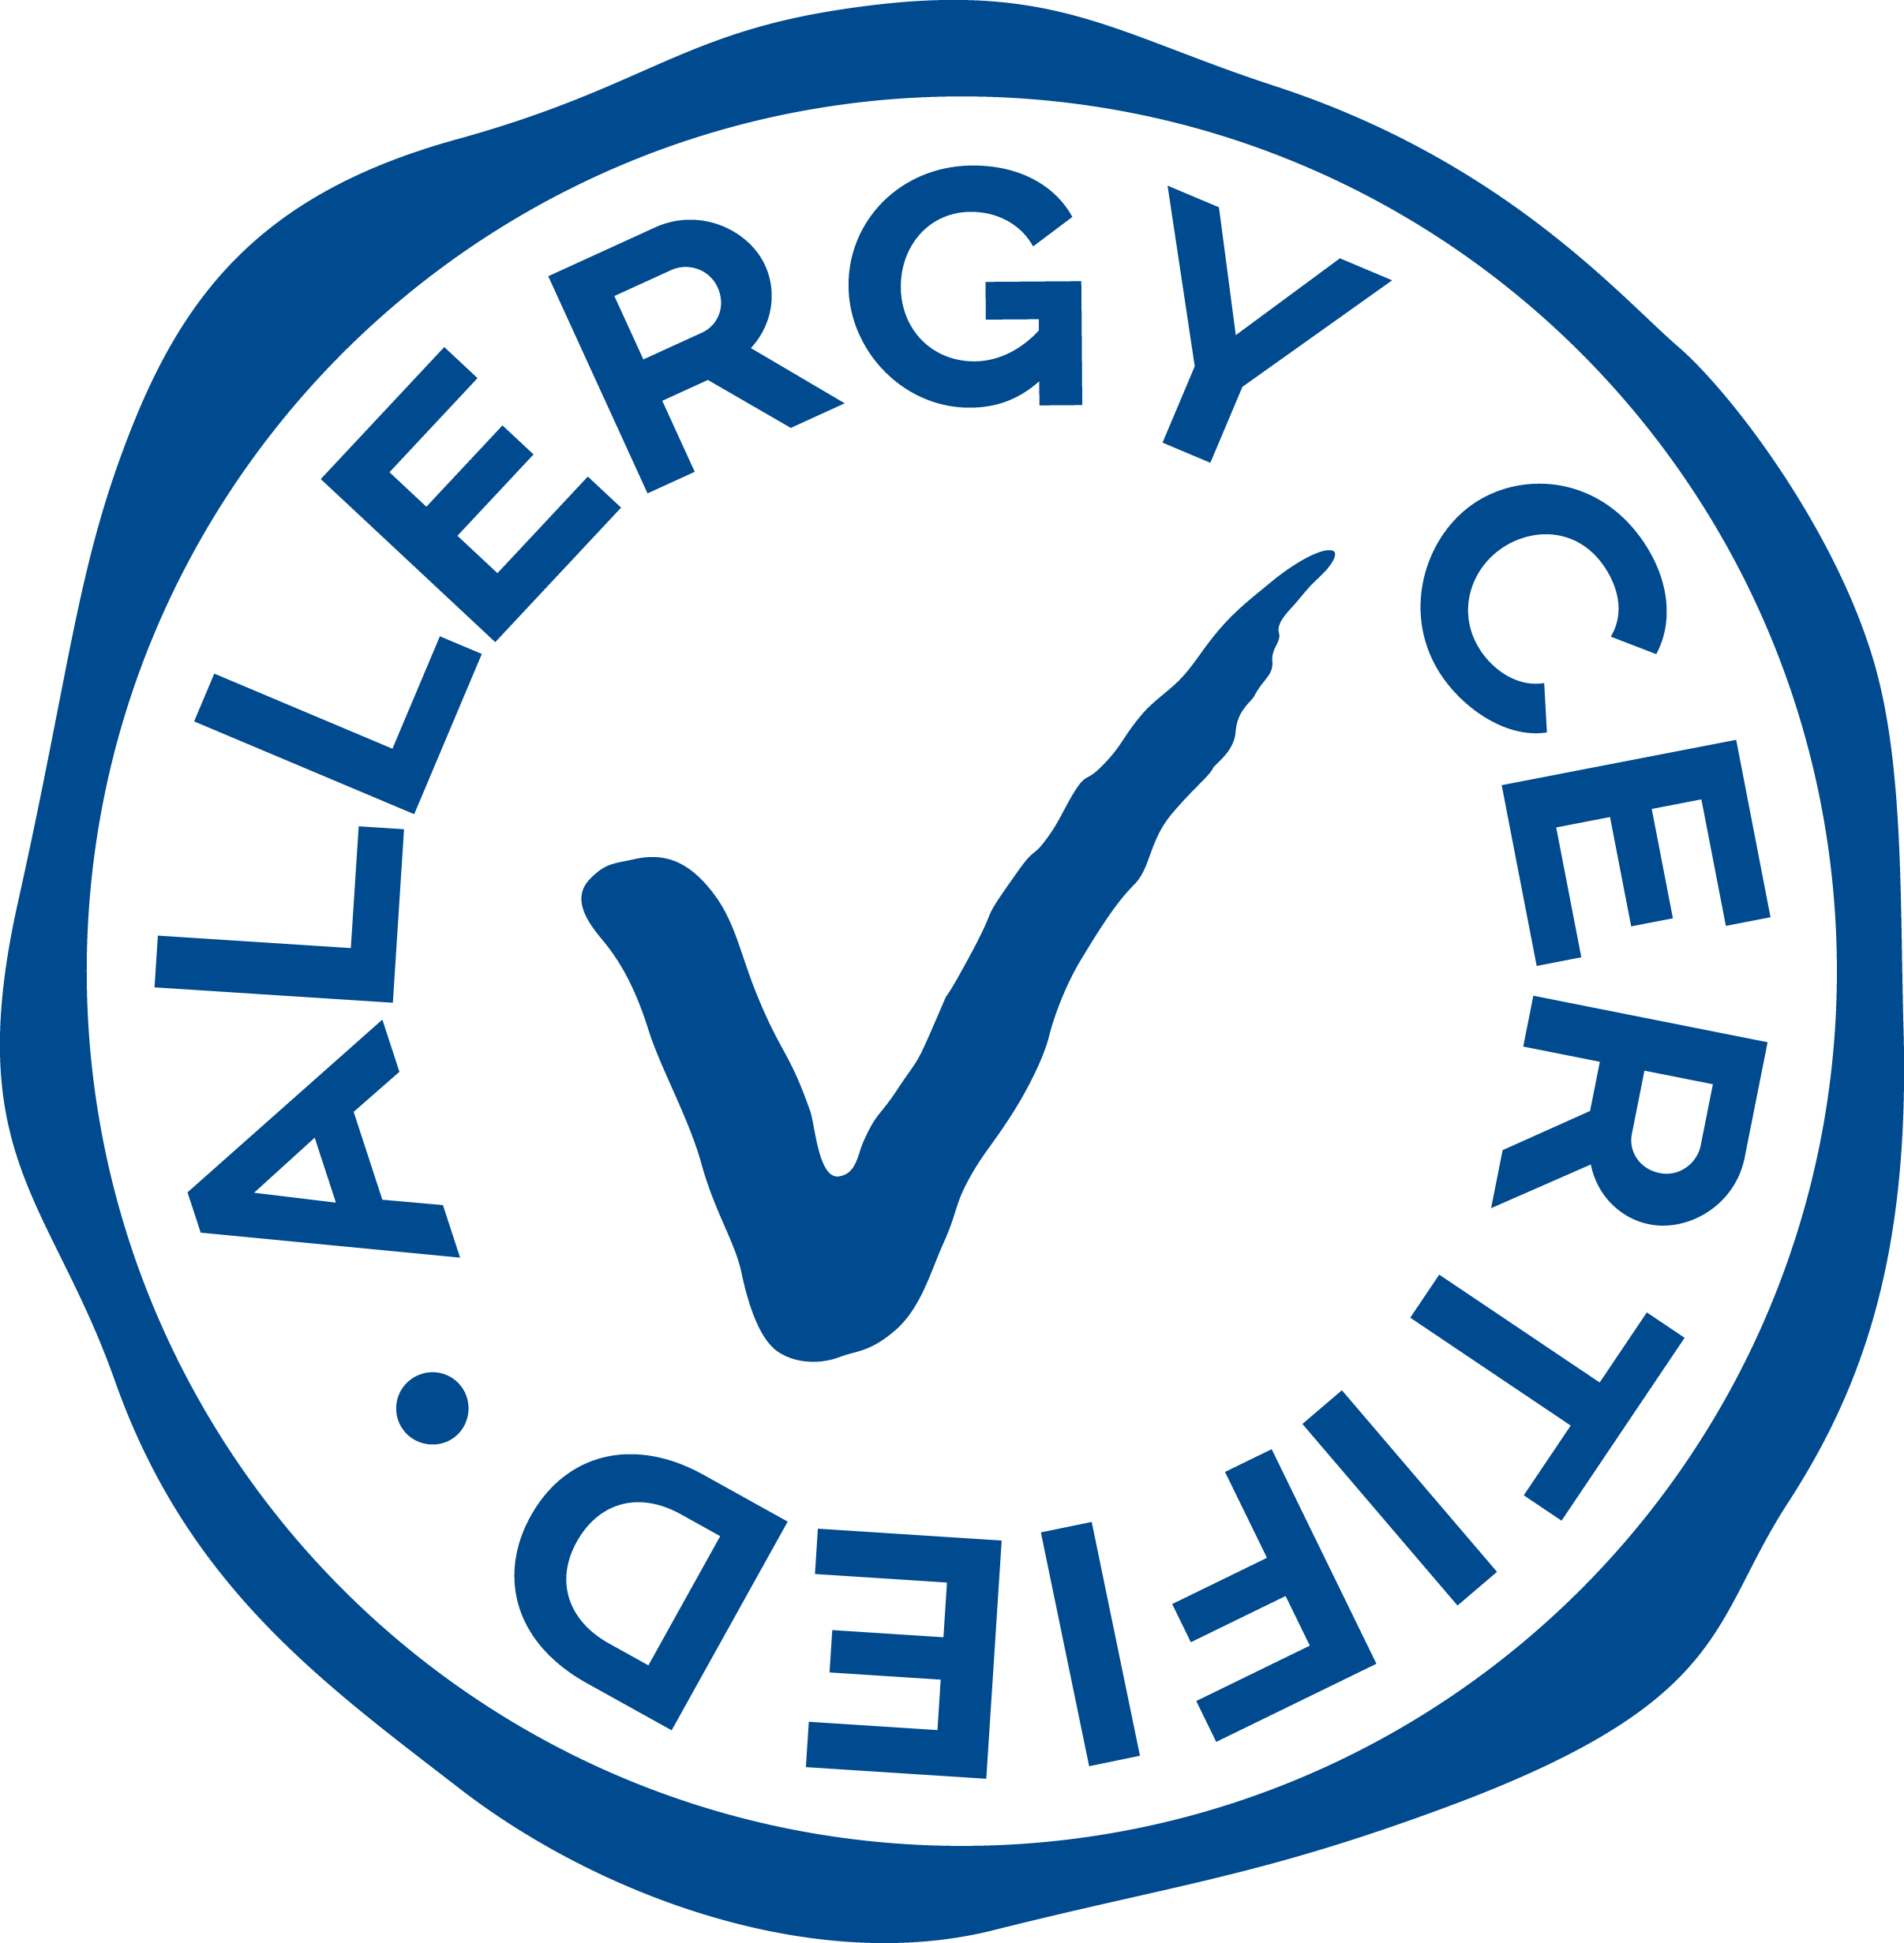 AllergyCertified